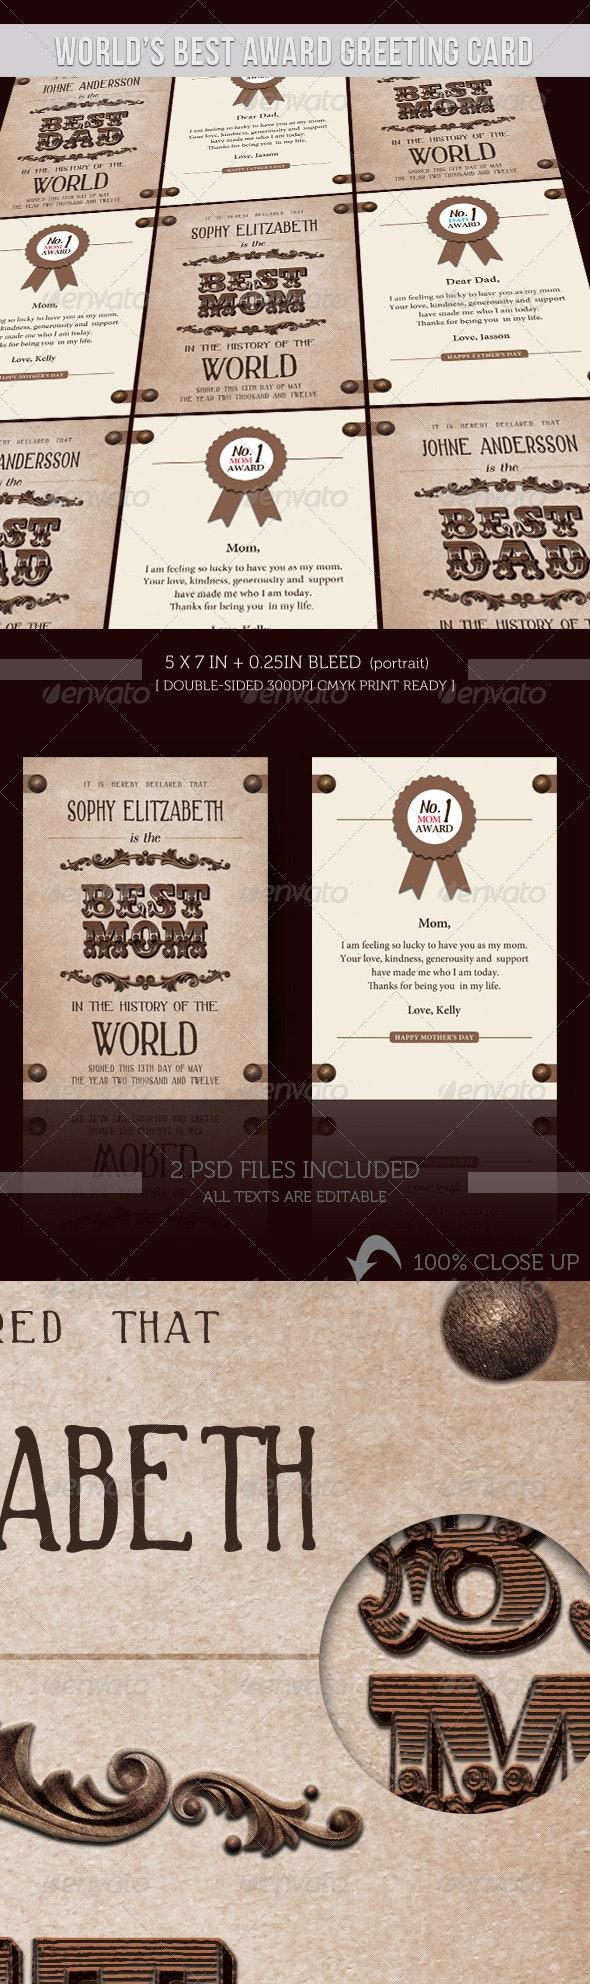 Greeting Card - World Best Award - Holiday Greeting Cards